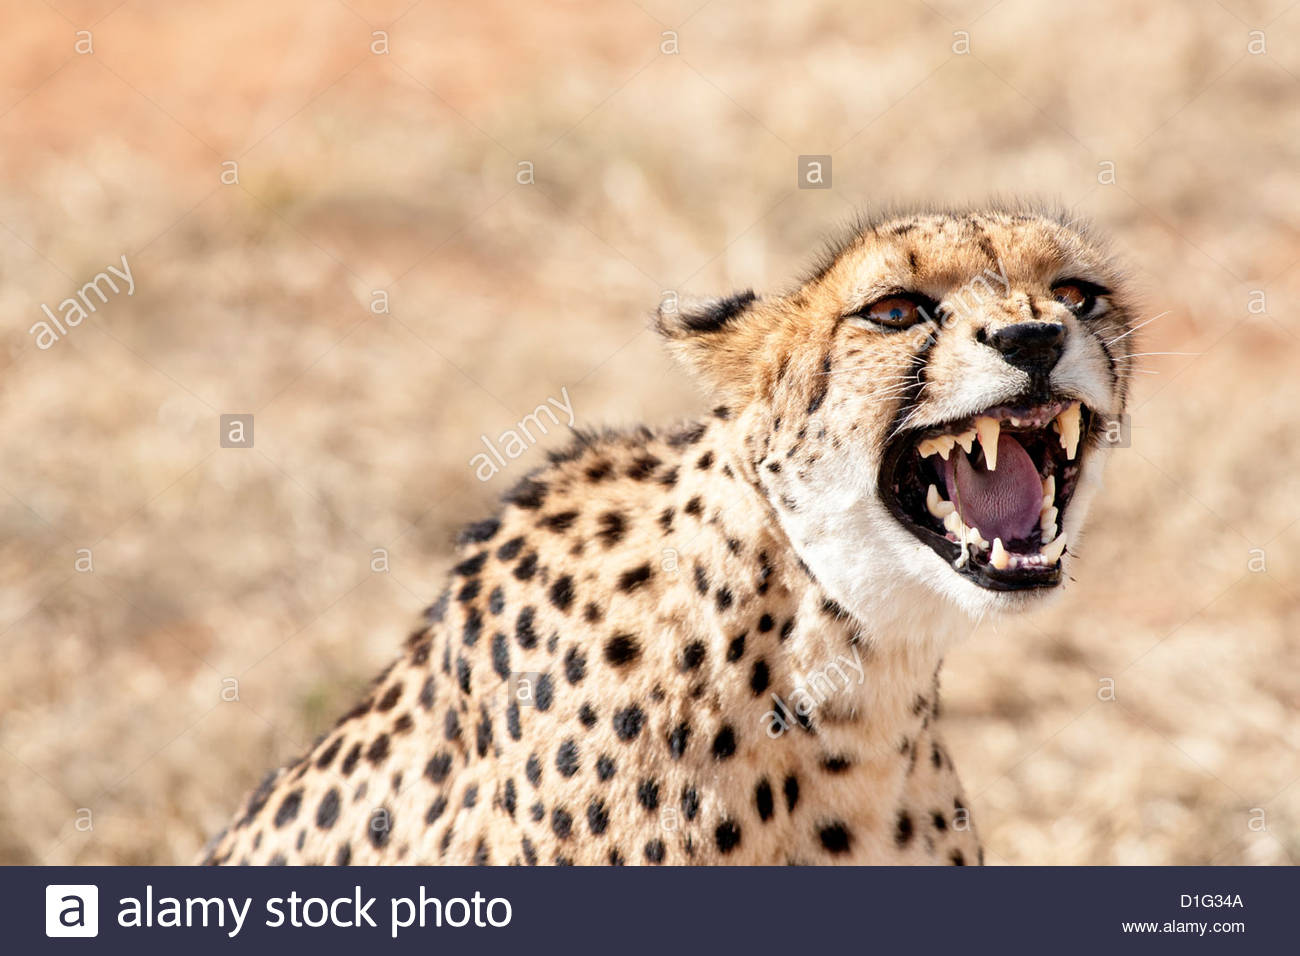 Snarling cheetah (Acynonix jubatus) showing teeth, Kalahari plains, Namibia, Africa Stock Photo